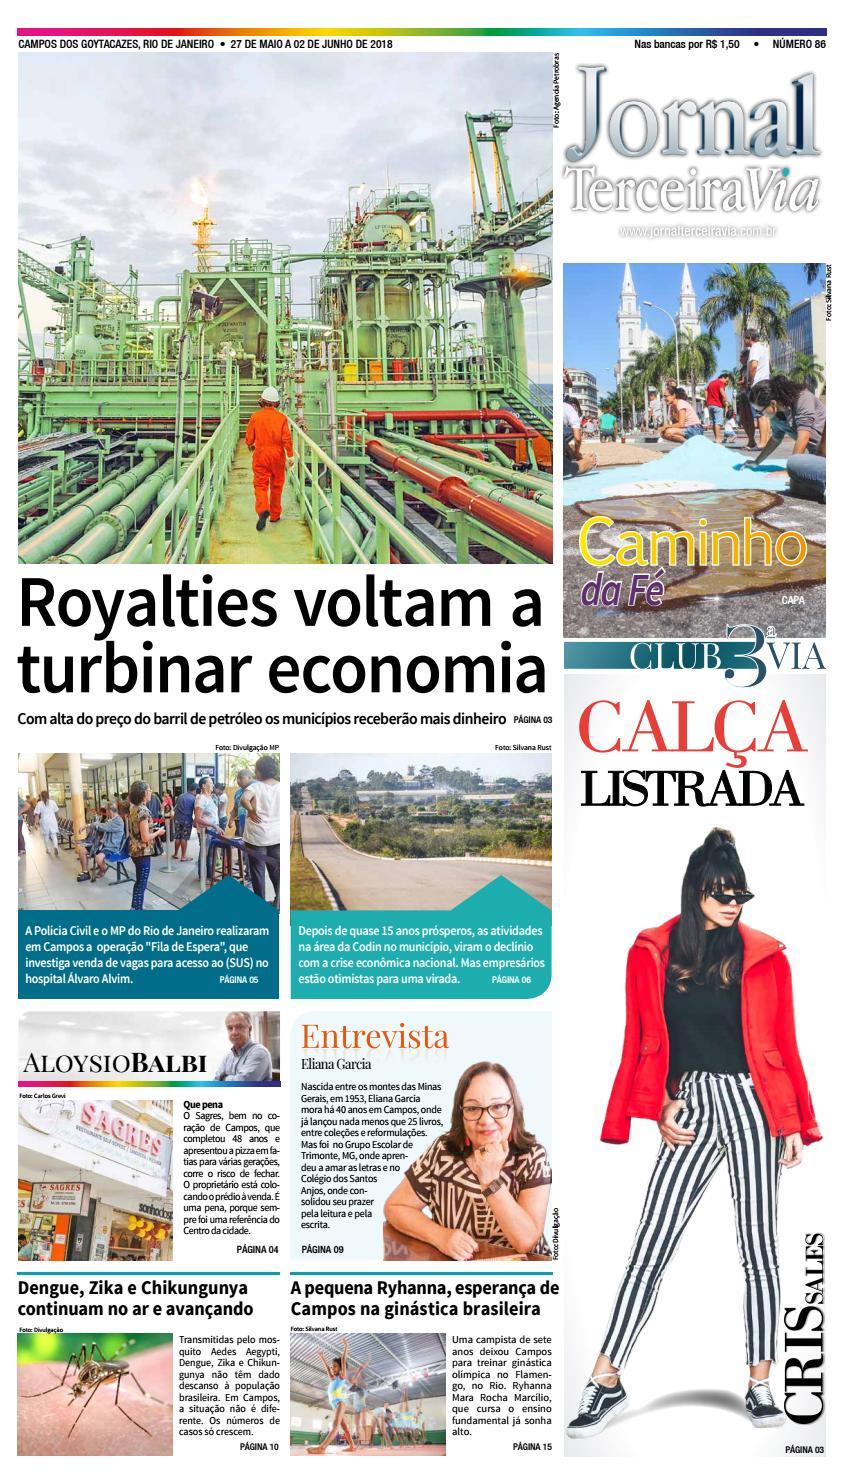 Jornal 3avia edicao86 by terceiravia - issuu adf51bcf58a29